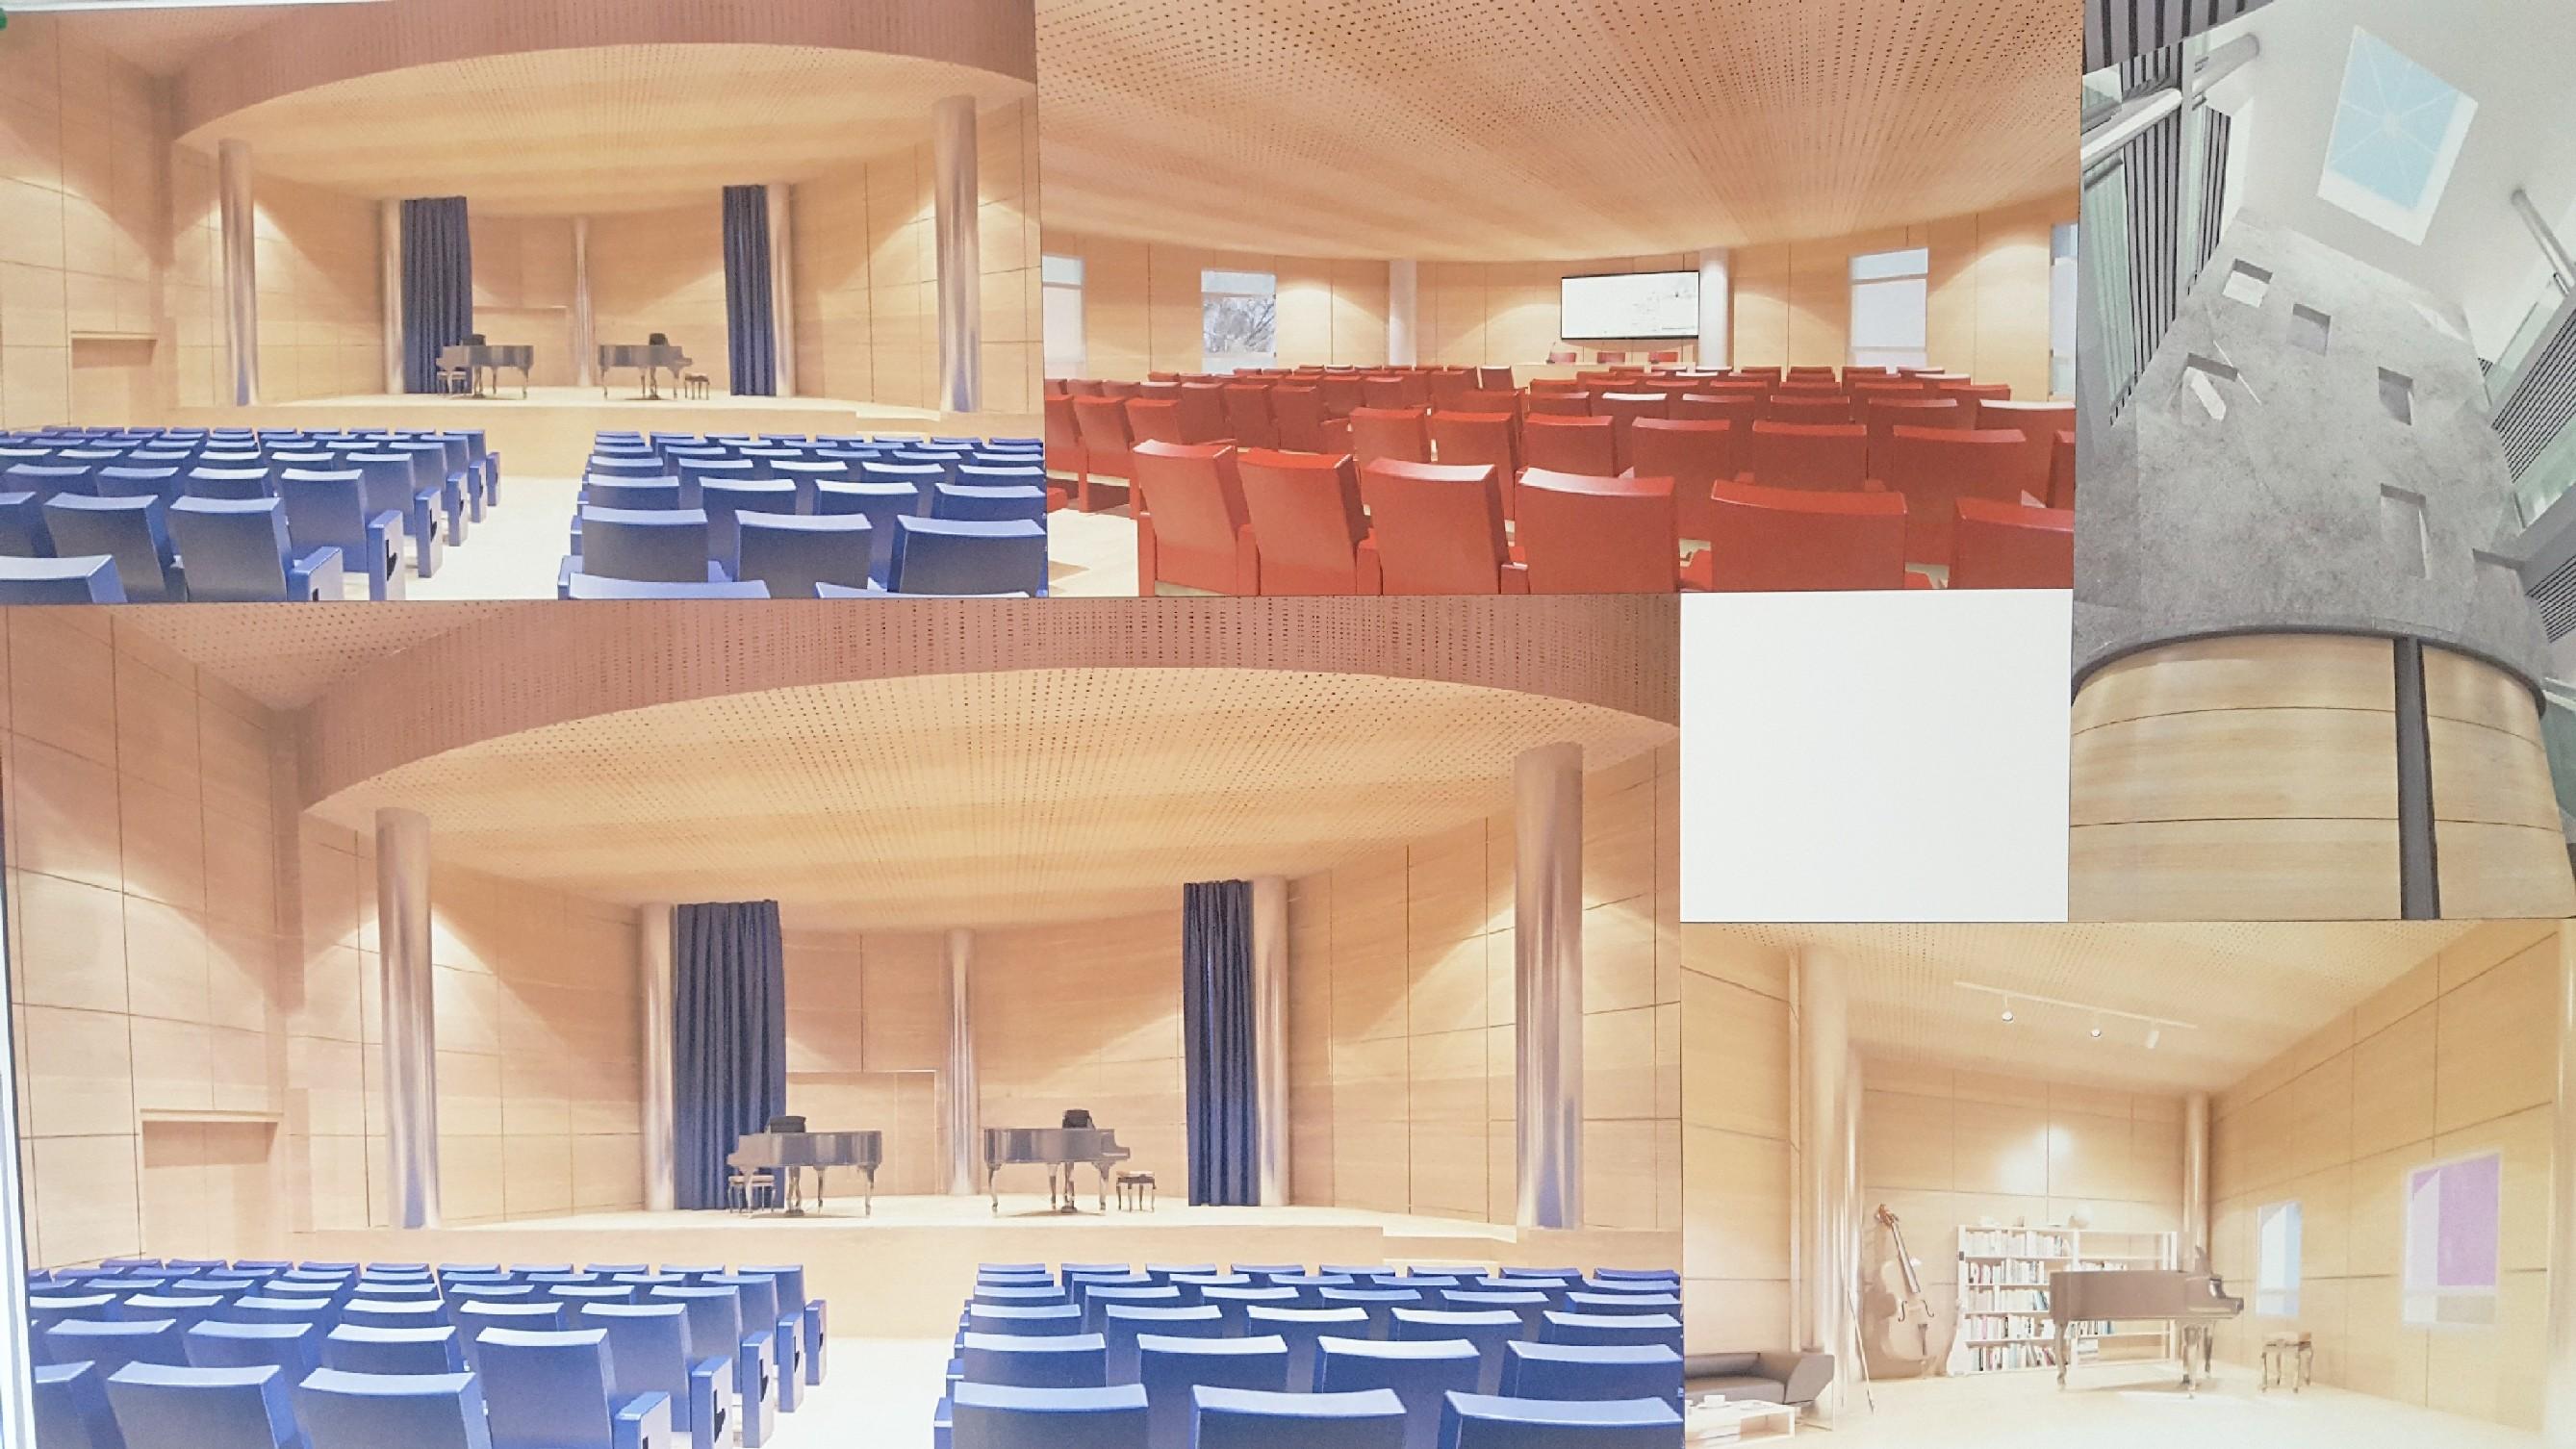 Proyecto Escuela de Musica San Mateo